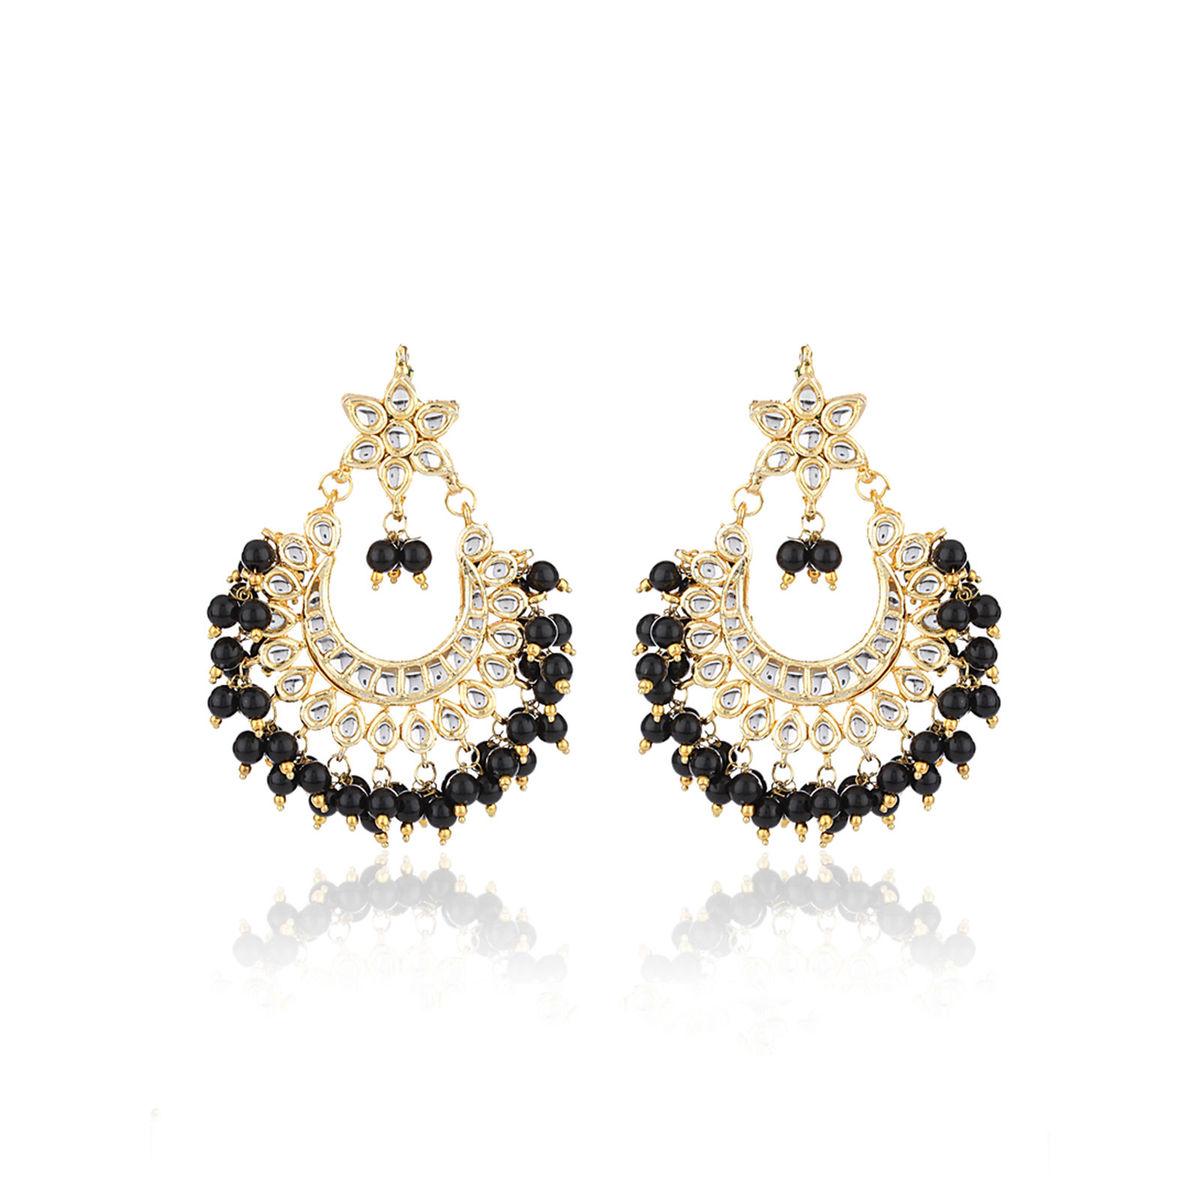 Black Bead Chandbali Earrings